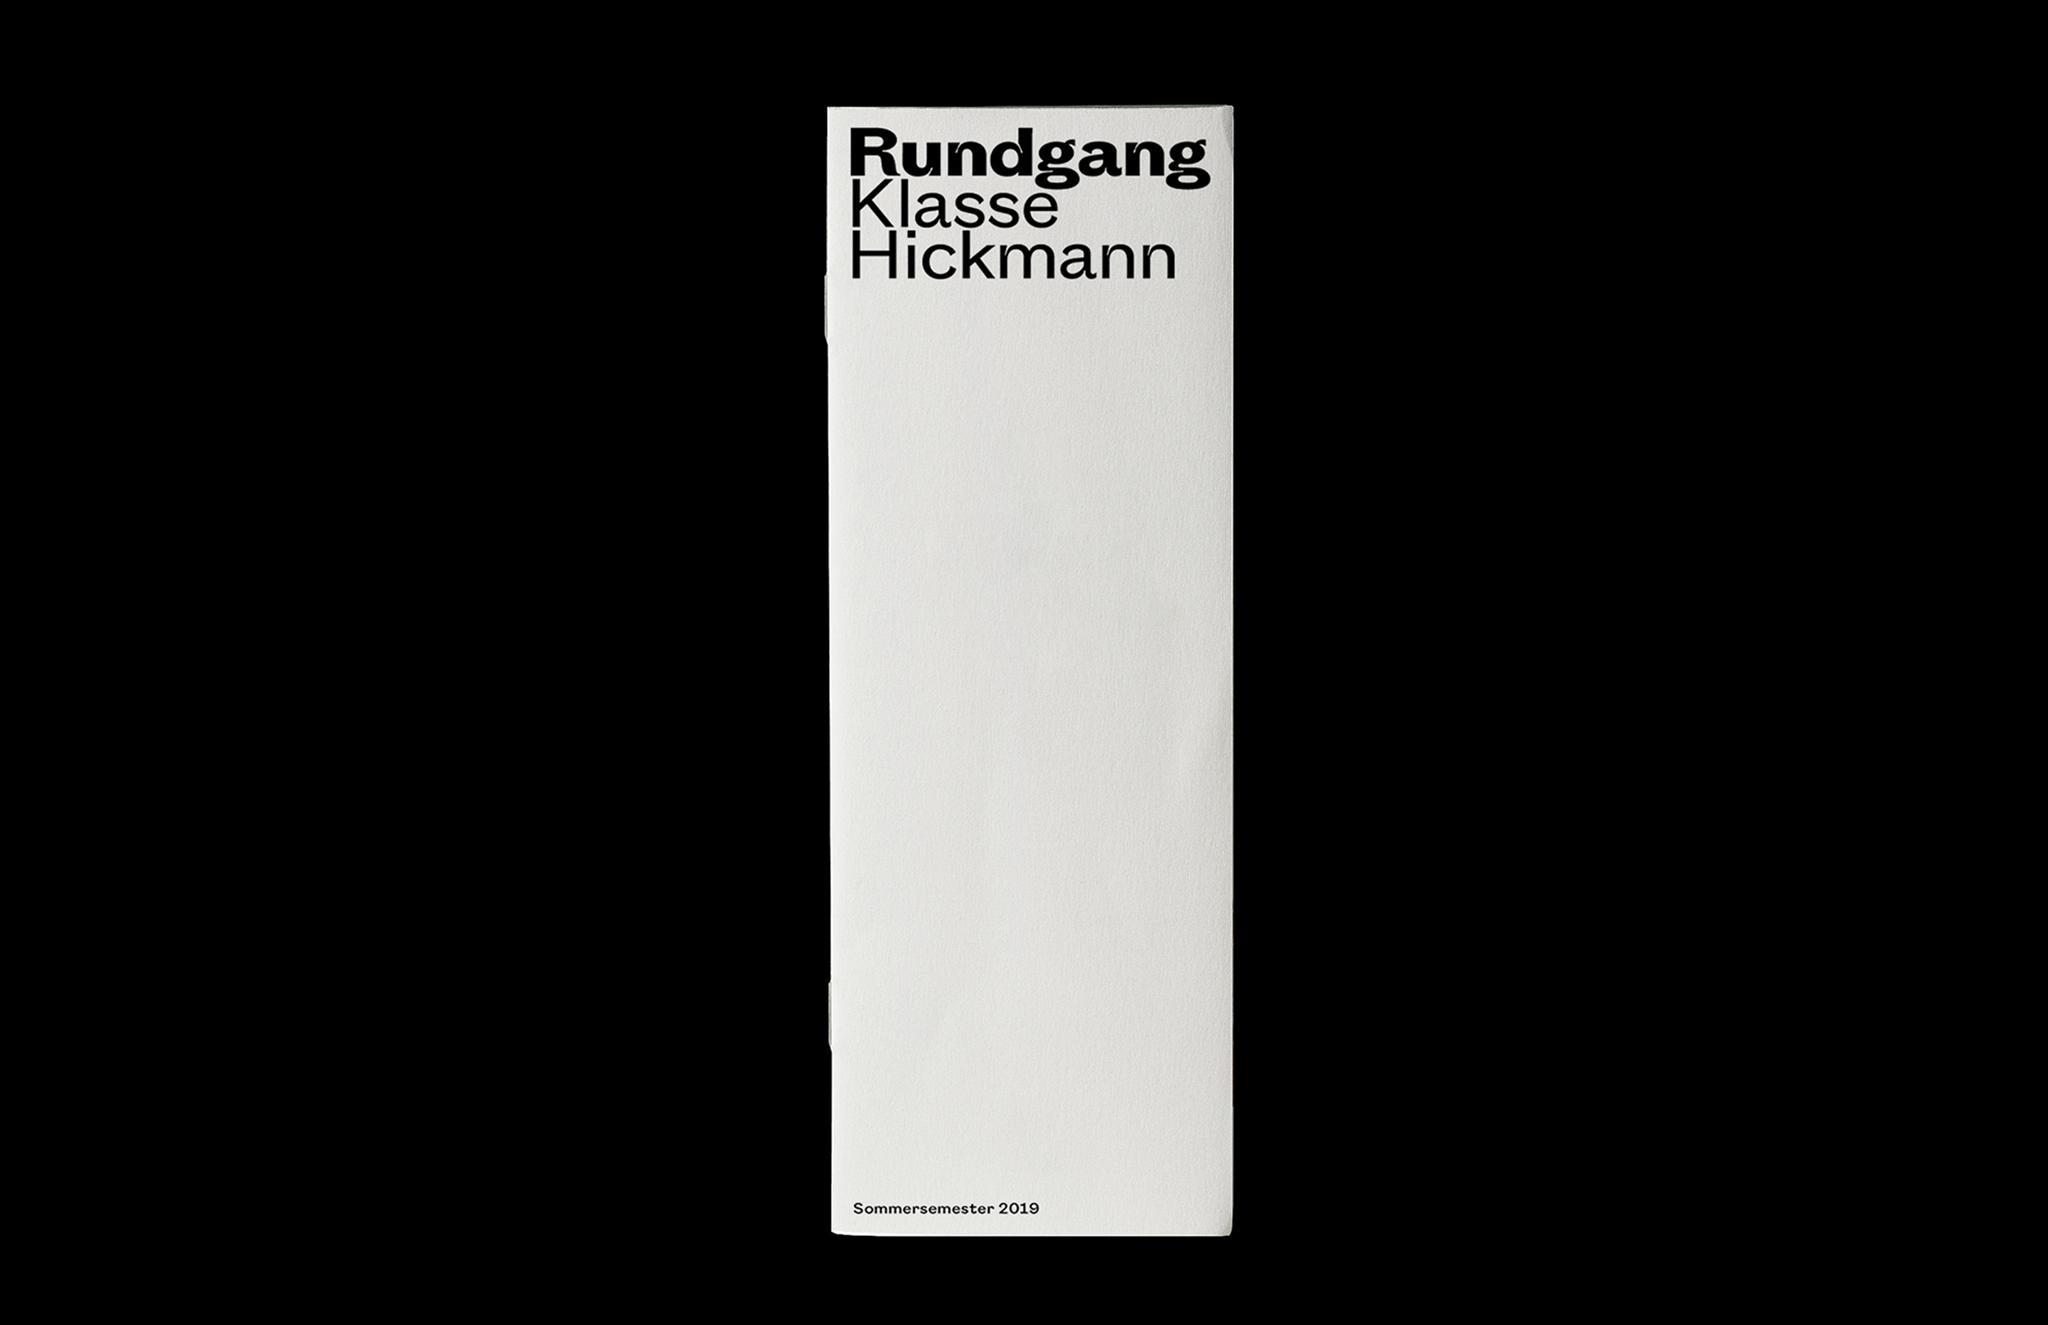 Rundgang Folder UdK Berlin Summersemester 2019 Cover